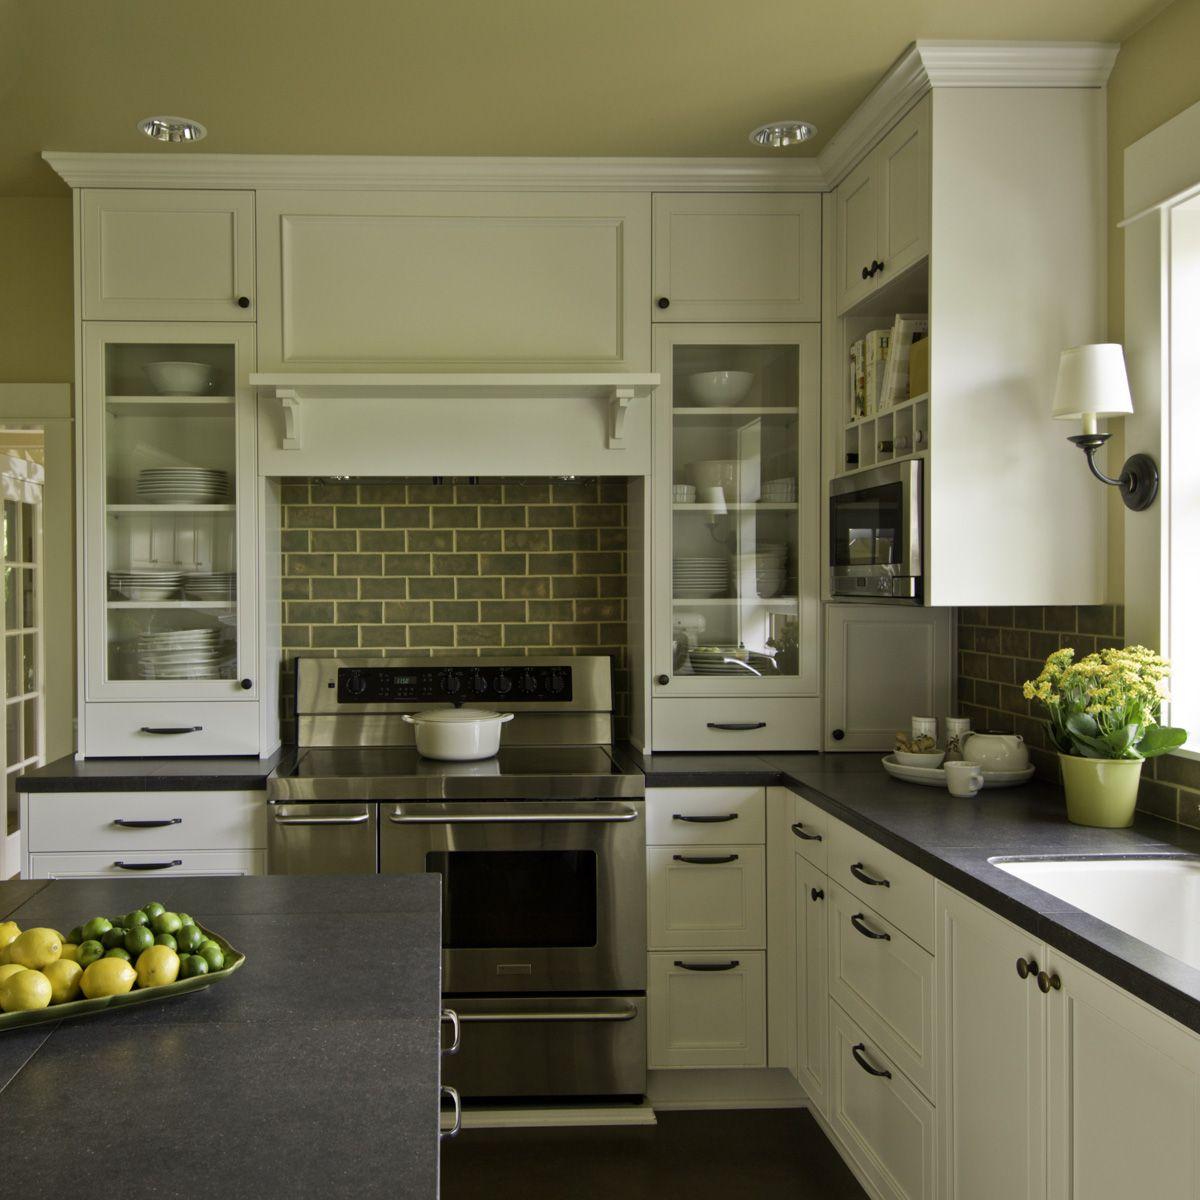 bungalow remodel kitchen classic bungalow kitchen remodel portland oregon mosaik design on kitchen remodel plans layout id=25702